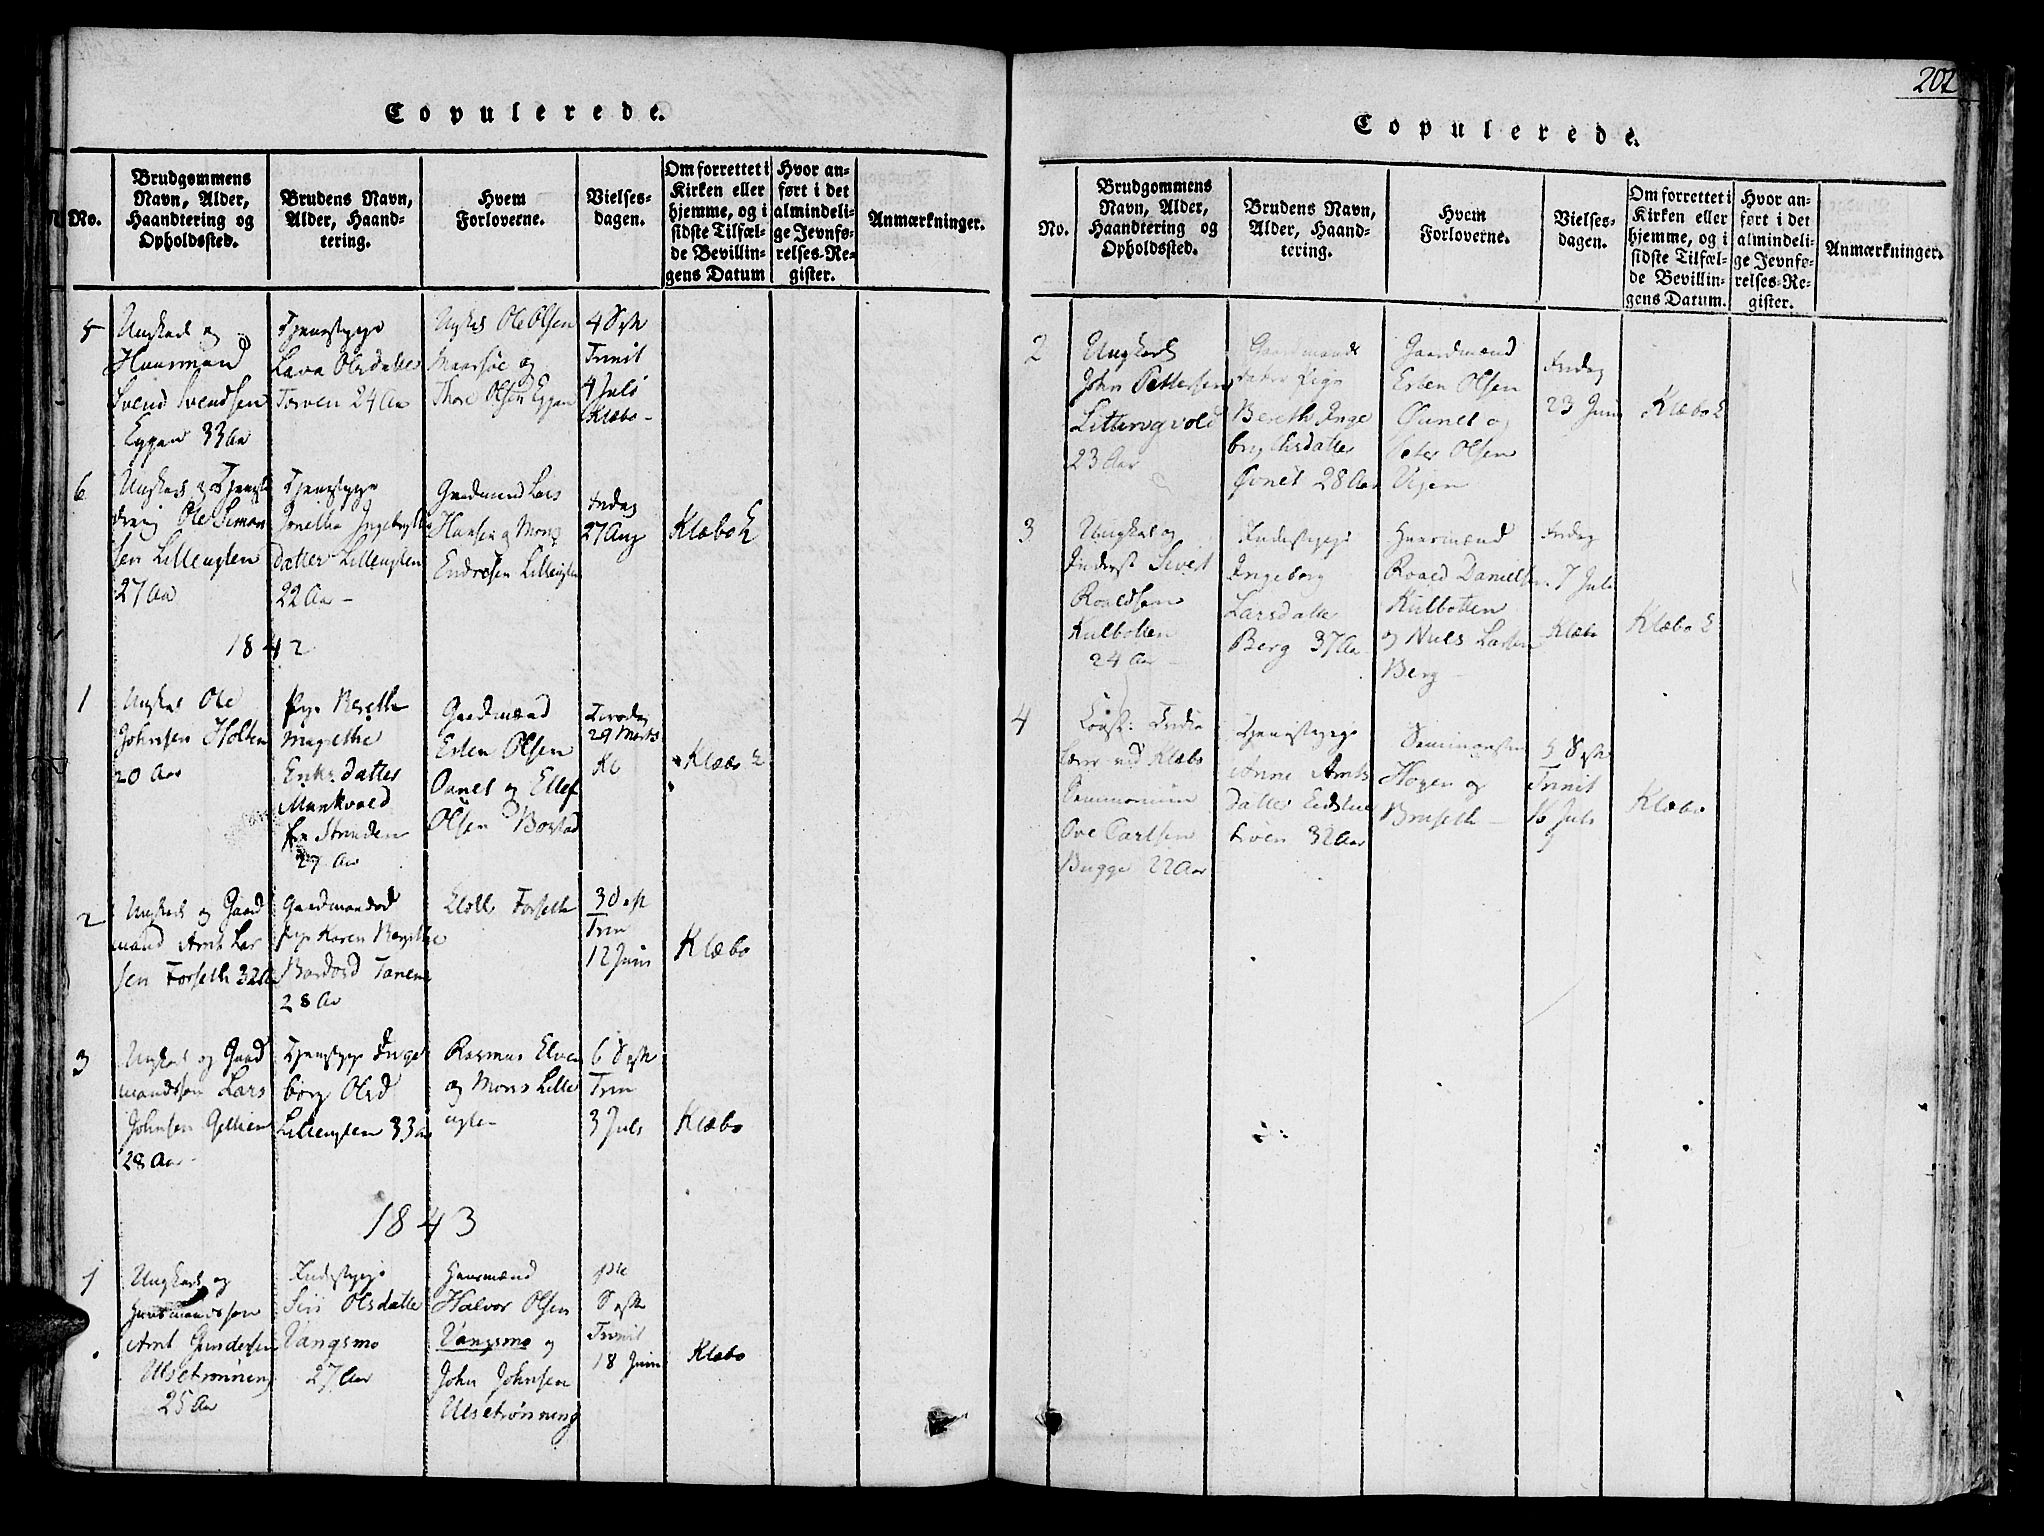 SAT, Ministerialprotokoller, klokkerbøker og fødselsregistre - Sør-Trøndelag, 618/L0439: Parish register (official) no. 618A04 /1, 1816-1843, p. 202